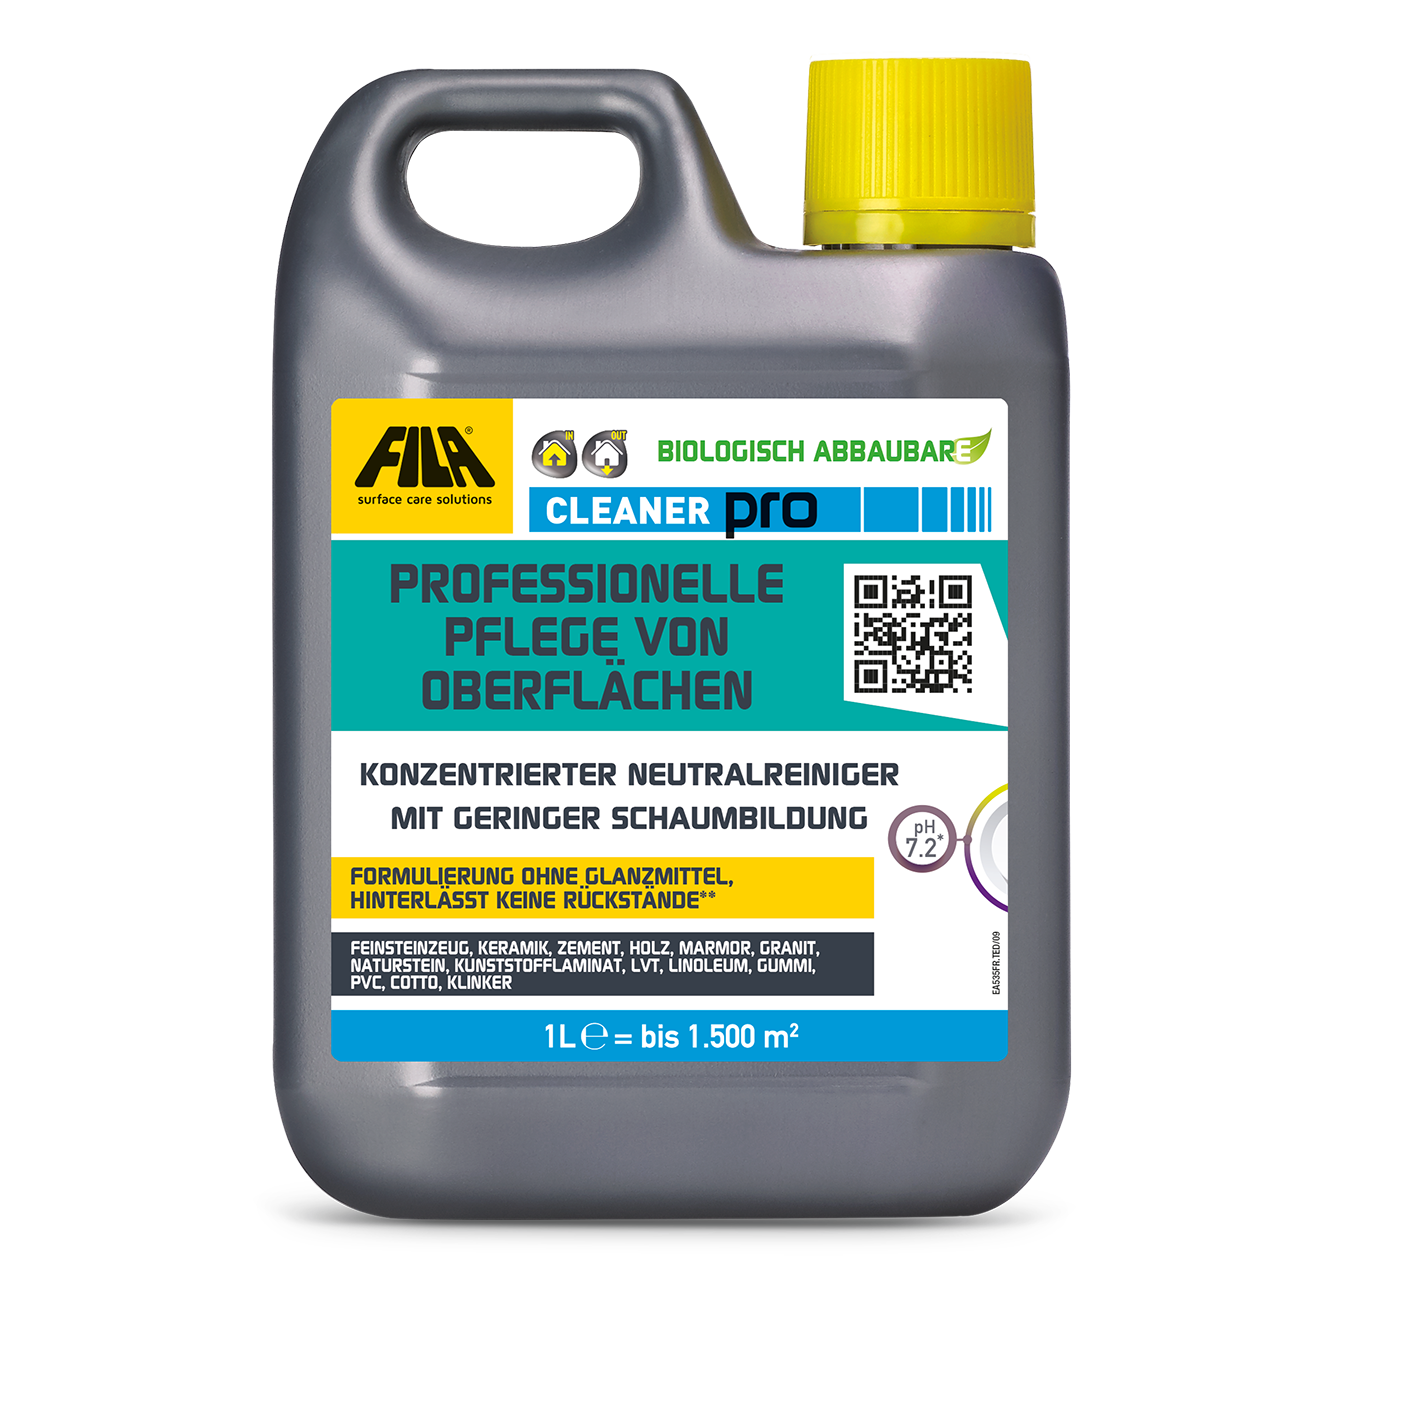 Fila Cleaner Pro - Unterhaltsreiniger - 1 Liter - rückstandsloser Natursteinreiniger